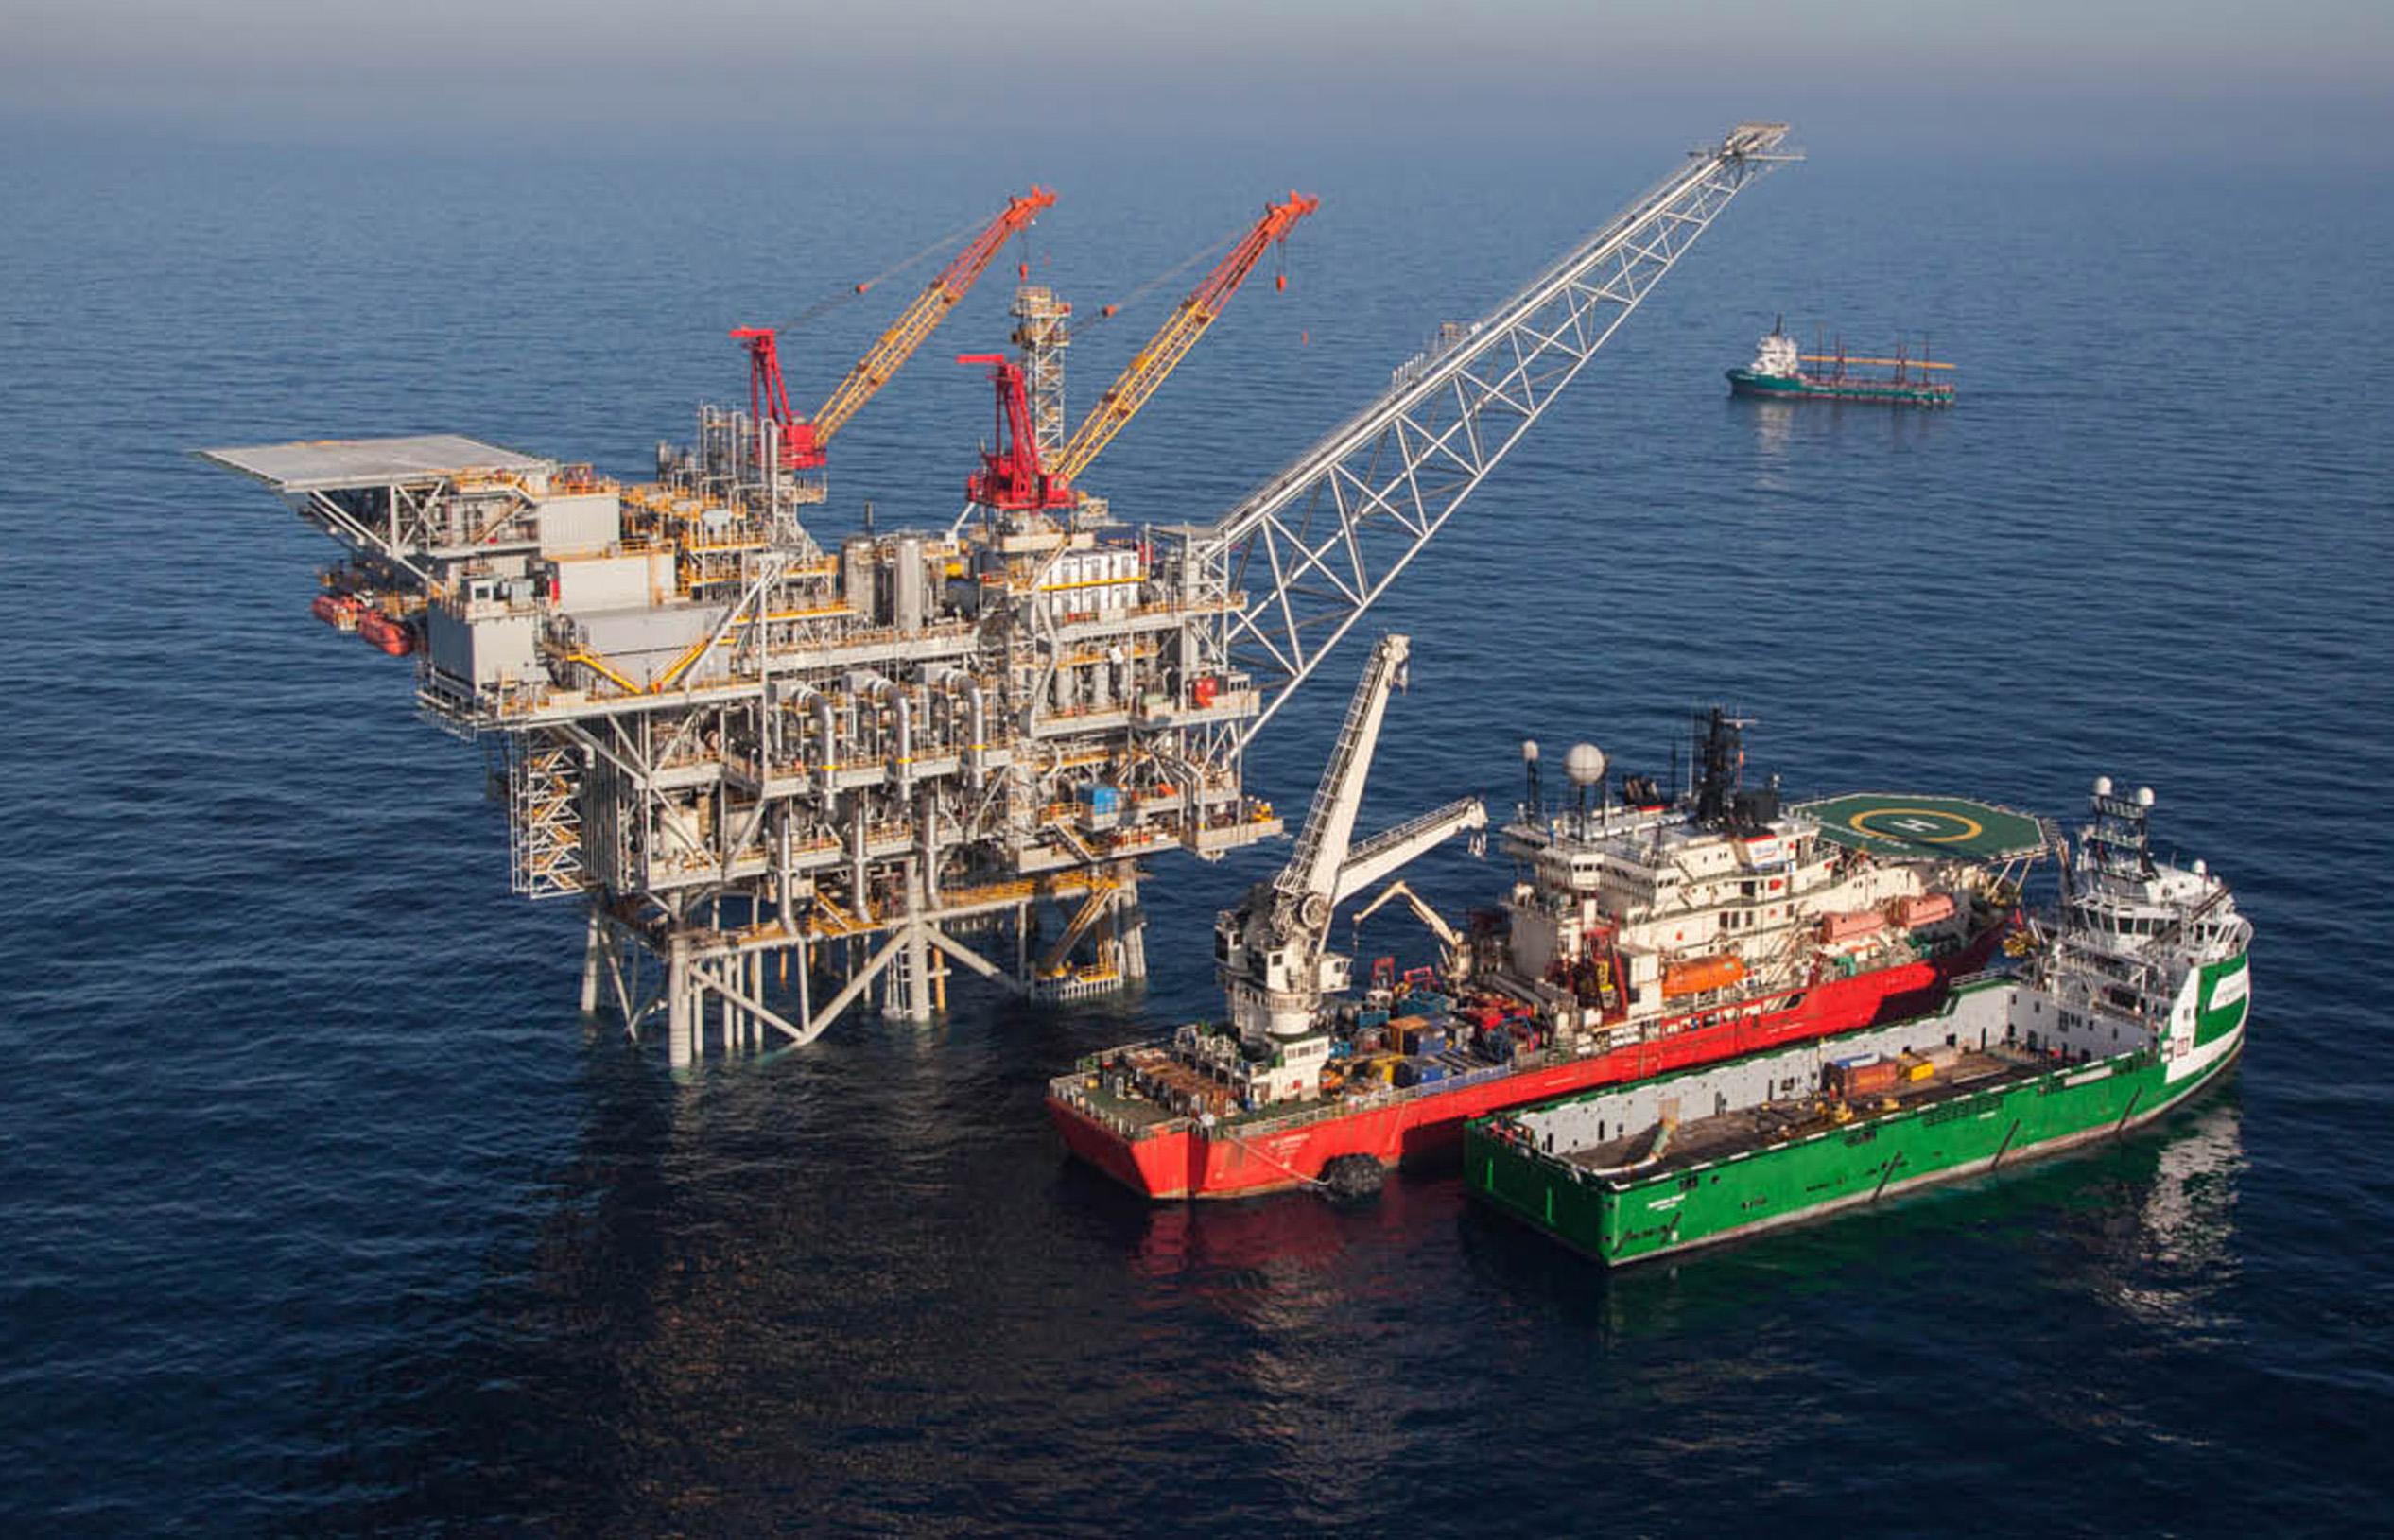 Israel-Egypt $15 Billion Gas Deal Boosts Energy Hub Prospects